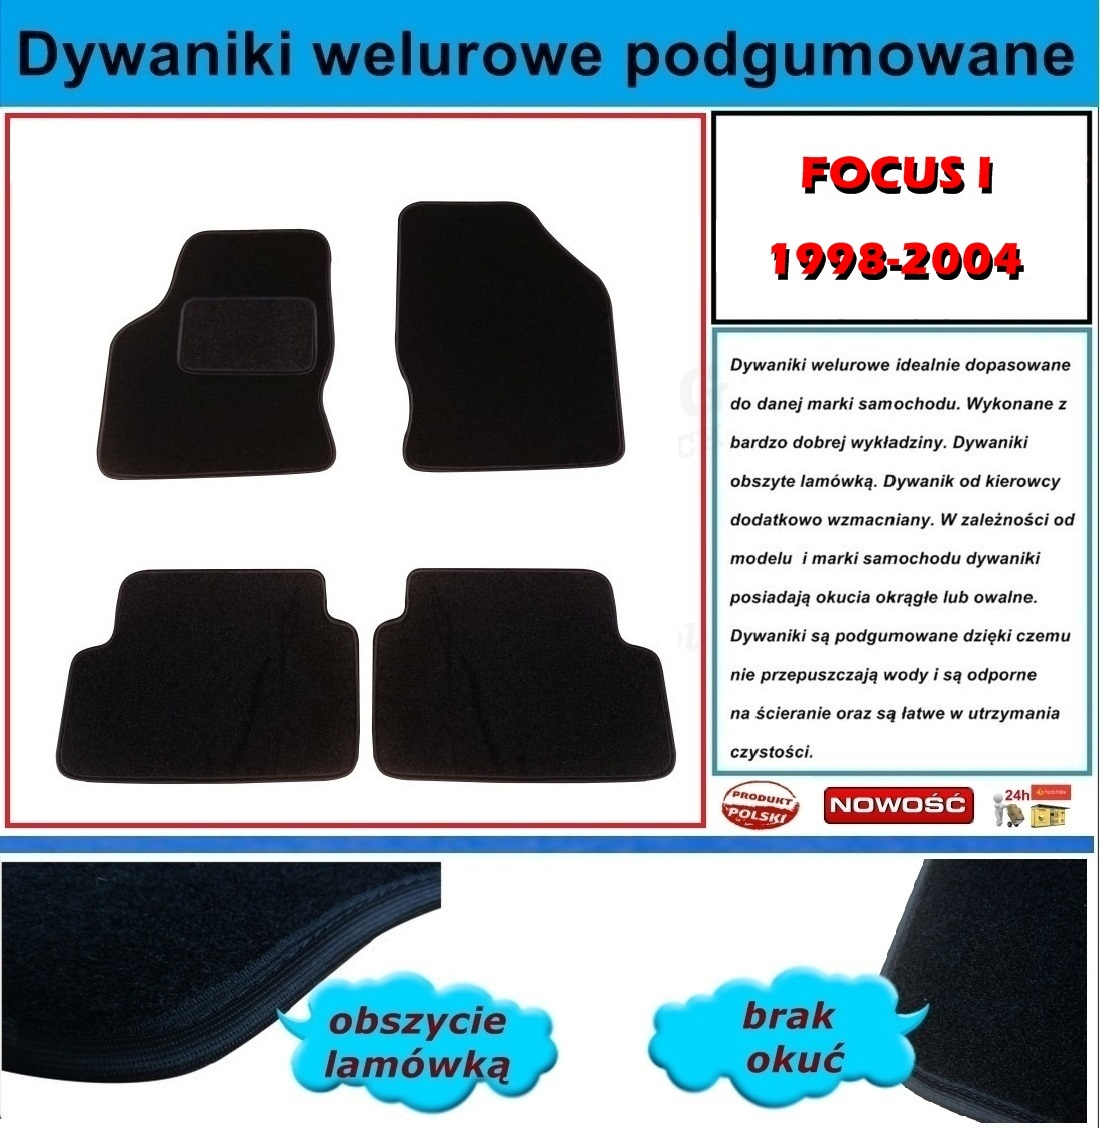 http://sklep.trio.com.pl/galerie/d/dywaniki-welurowe-do-samochod_27800.jpg